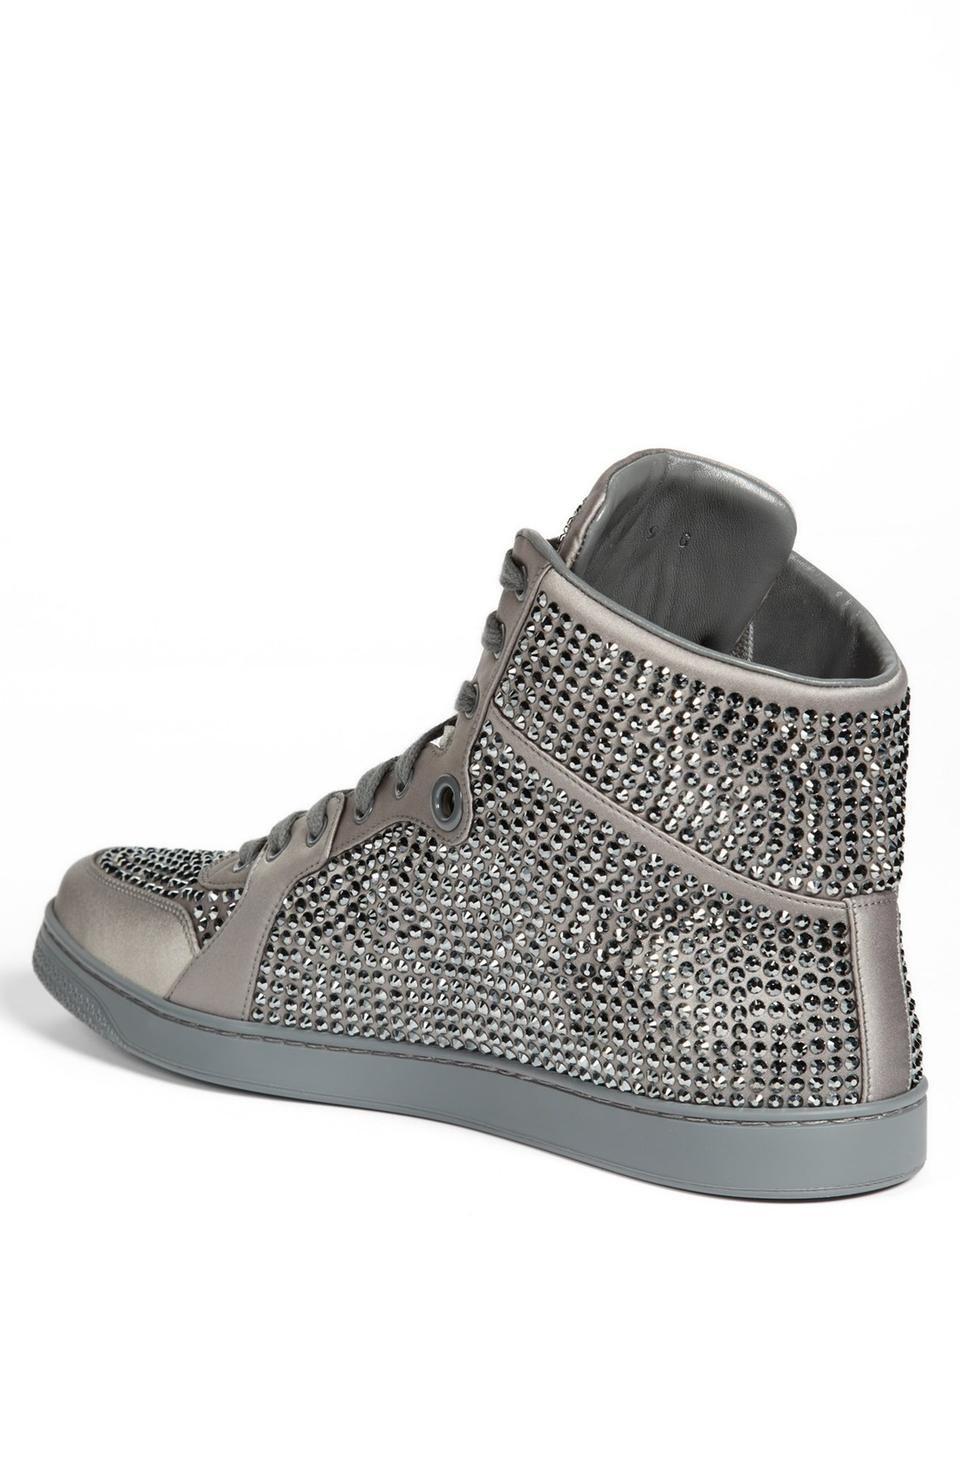 Gucci 'Coda' Crystal High Top Sneaker